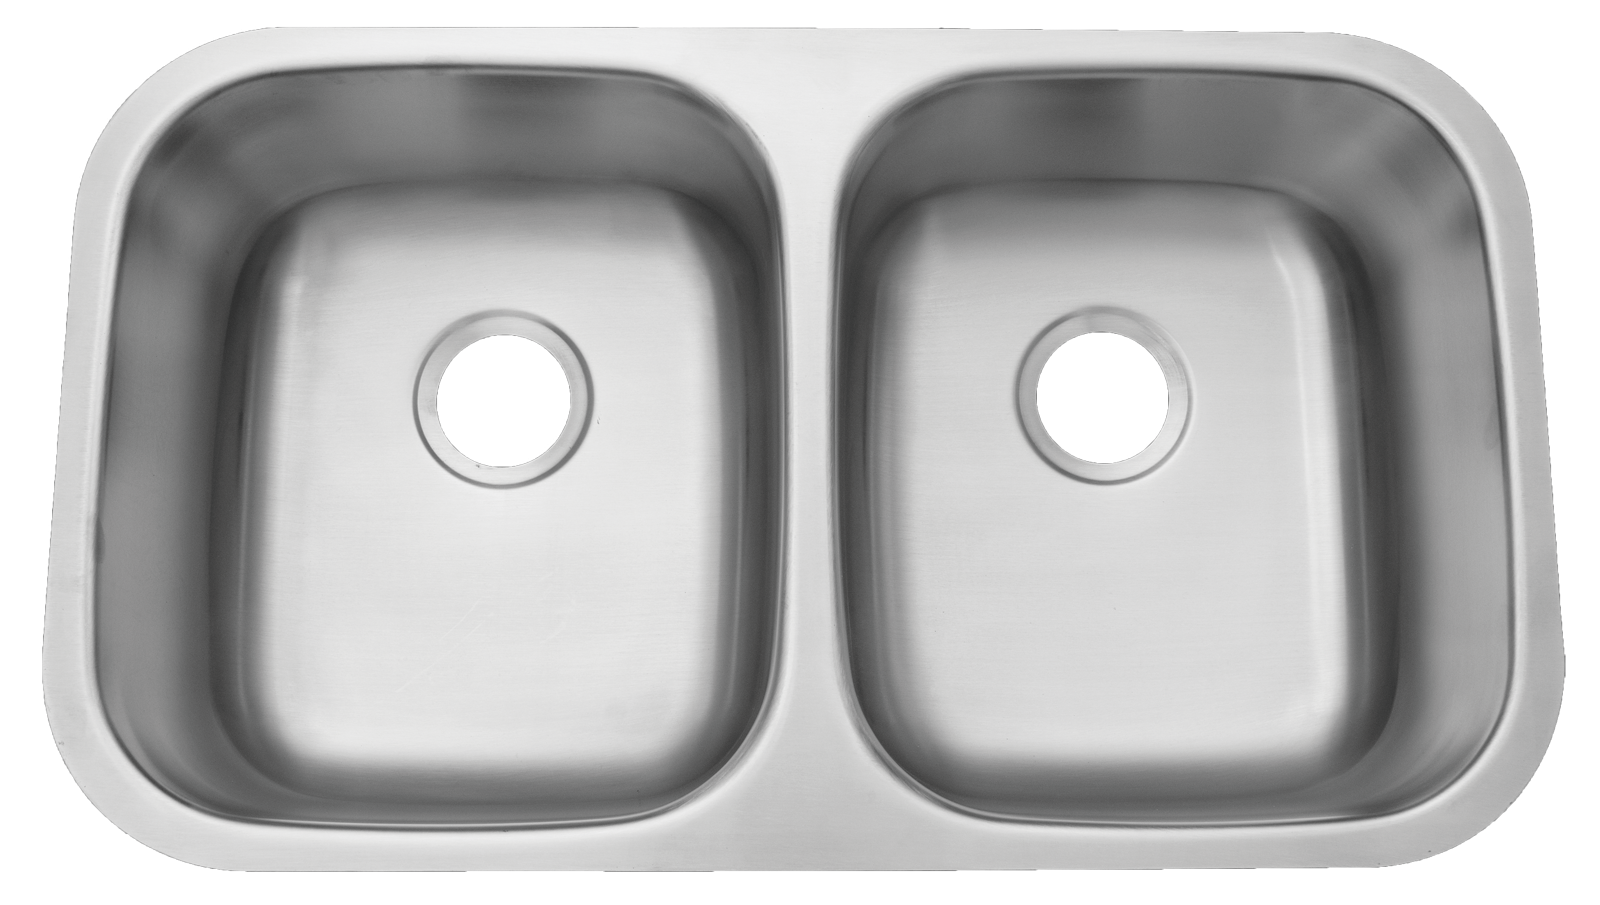 Superieur ADA Compliant 20 Gauge Stainless Steel Undermount Sink   50/50 Double Bowl